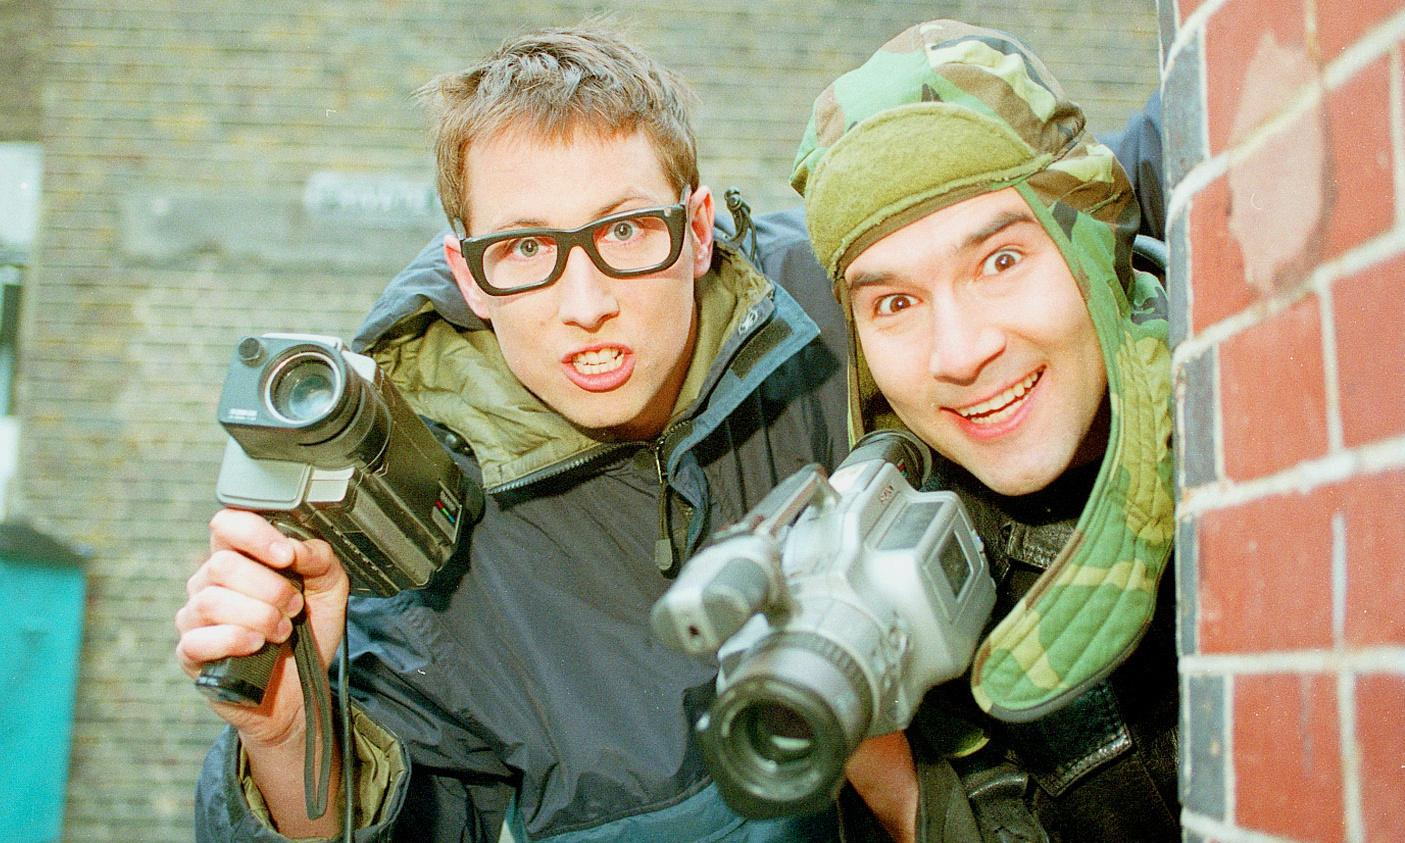 Adam Buxton and Joe Cornish: how we made The Adam and Joe Show